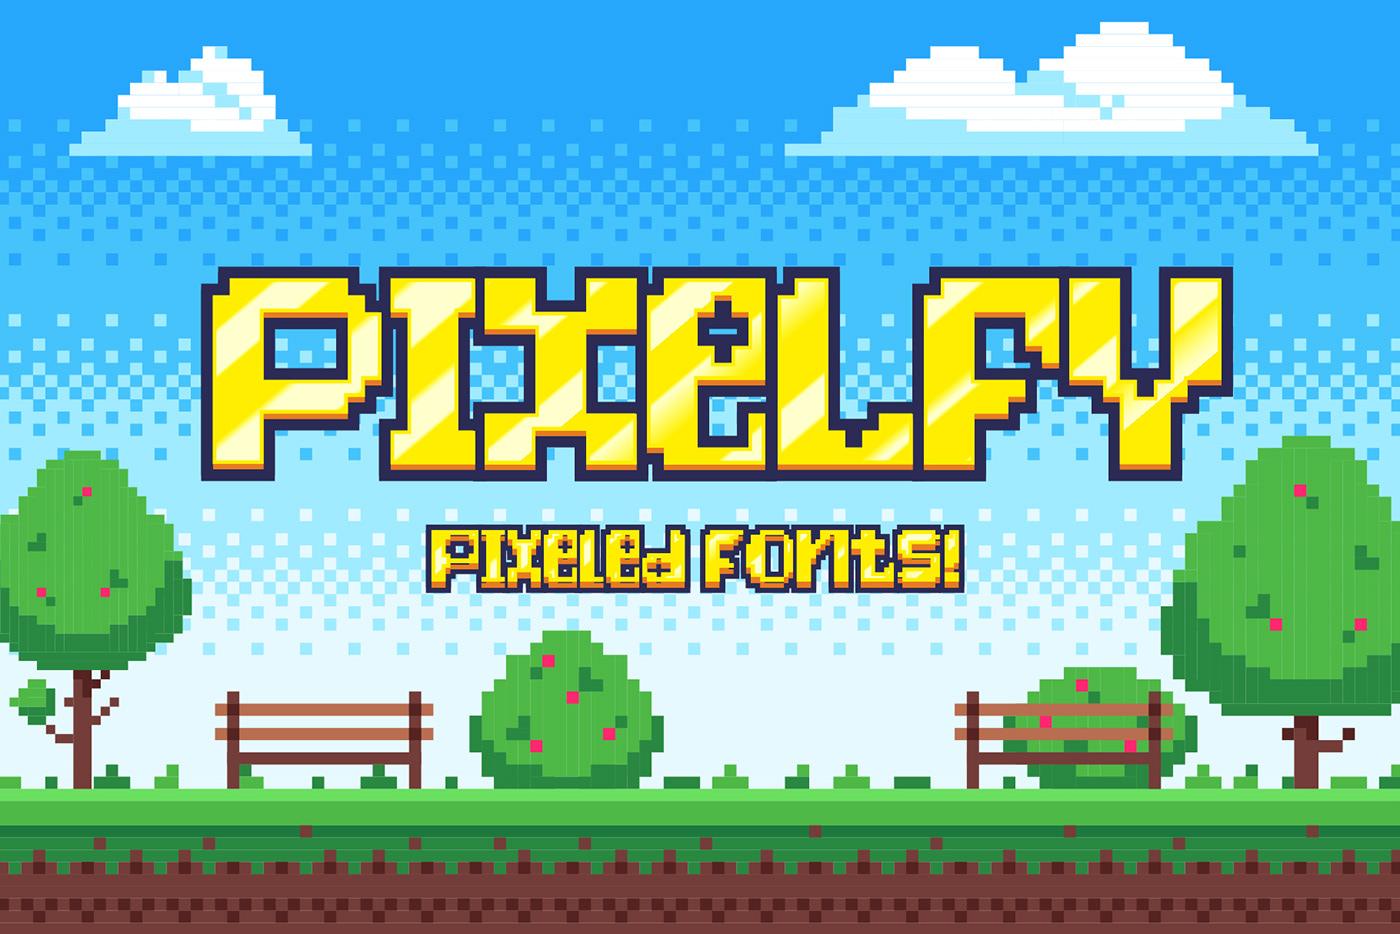 Pixelfy Free Font - bitmap-fonts